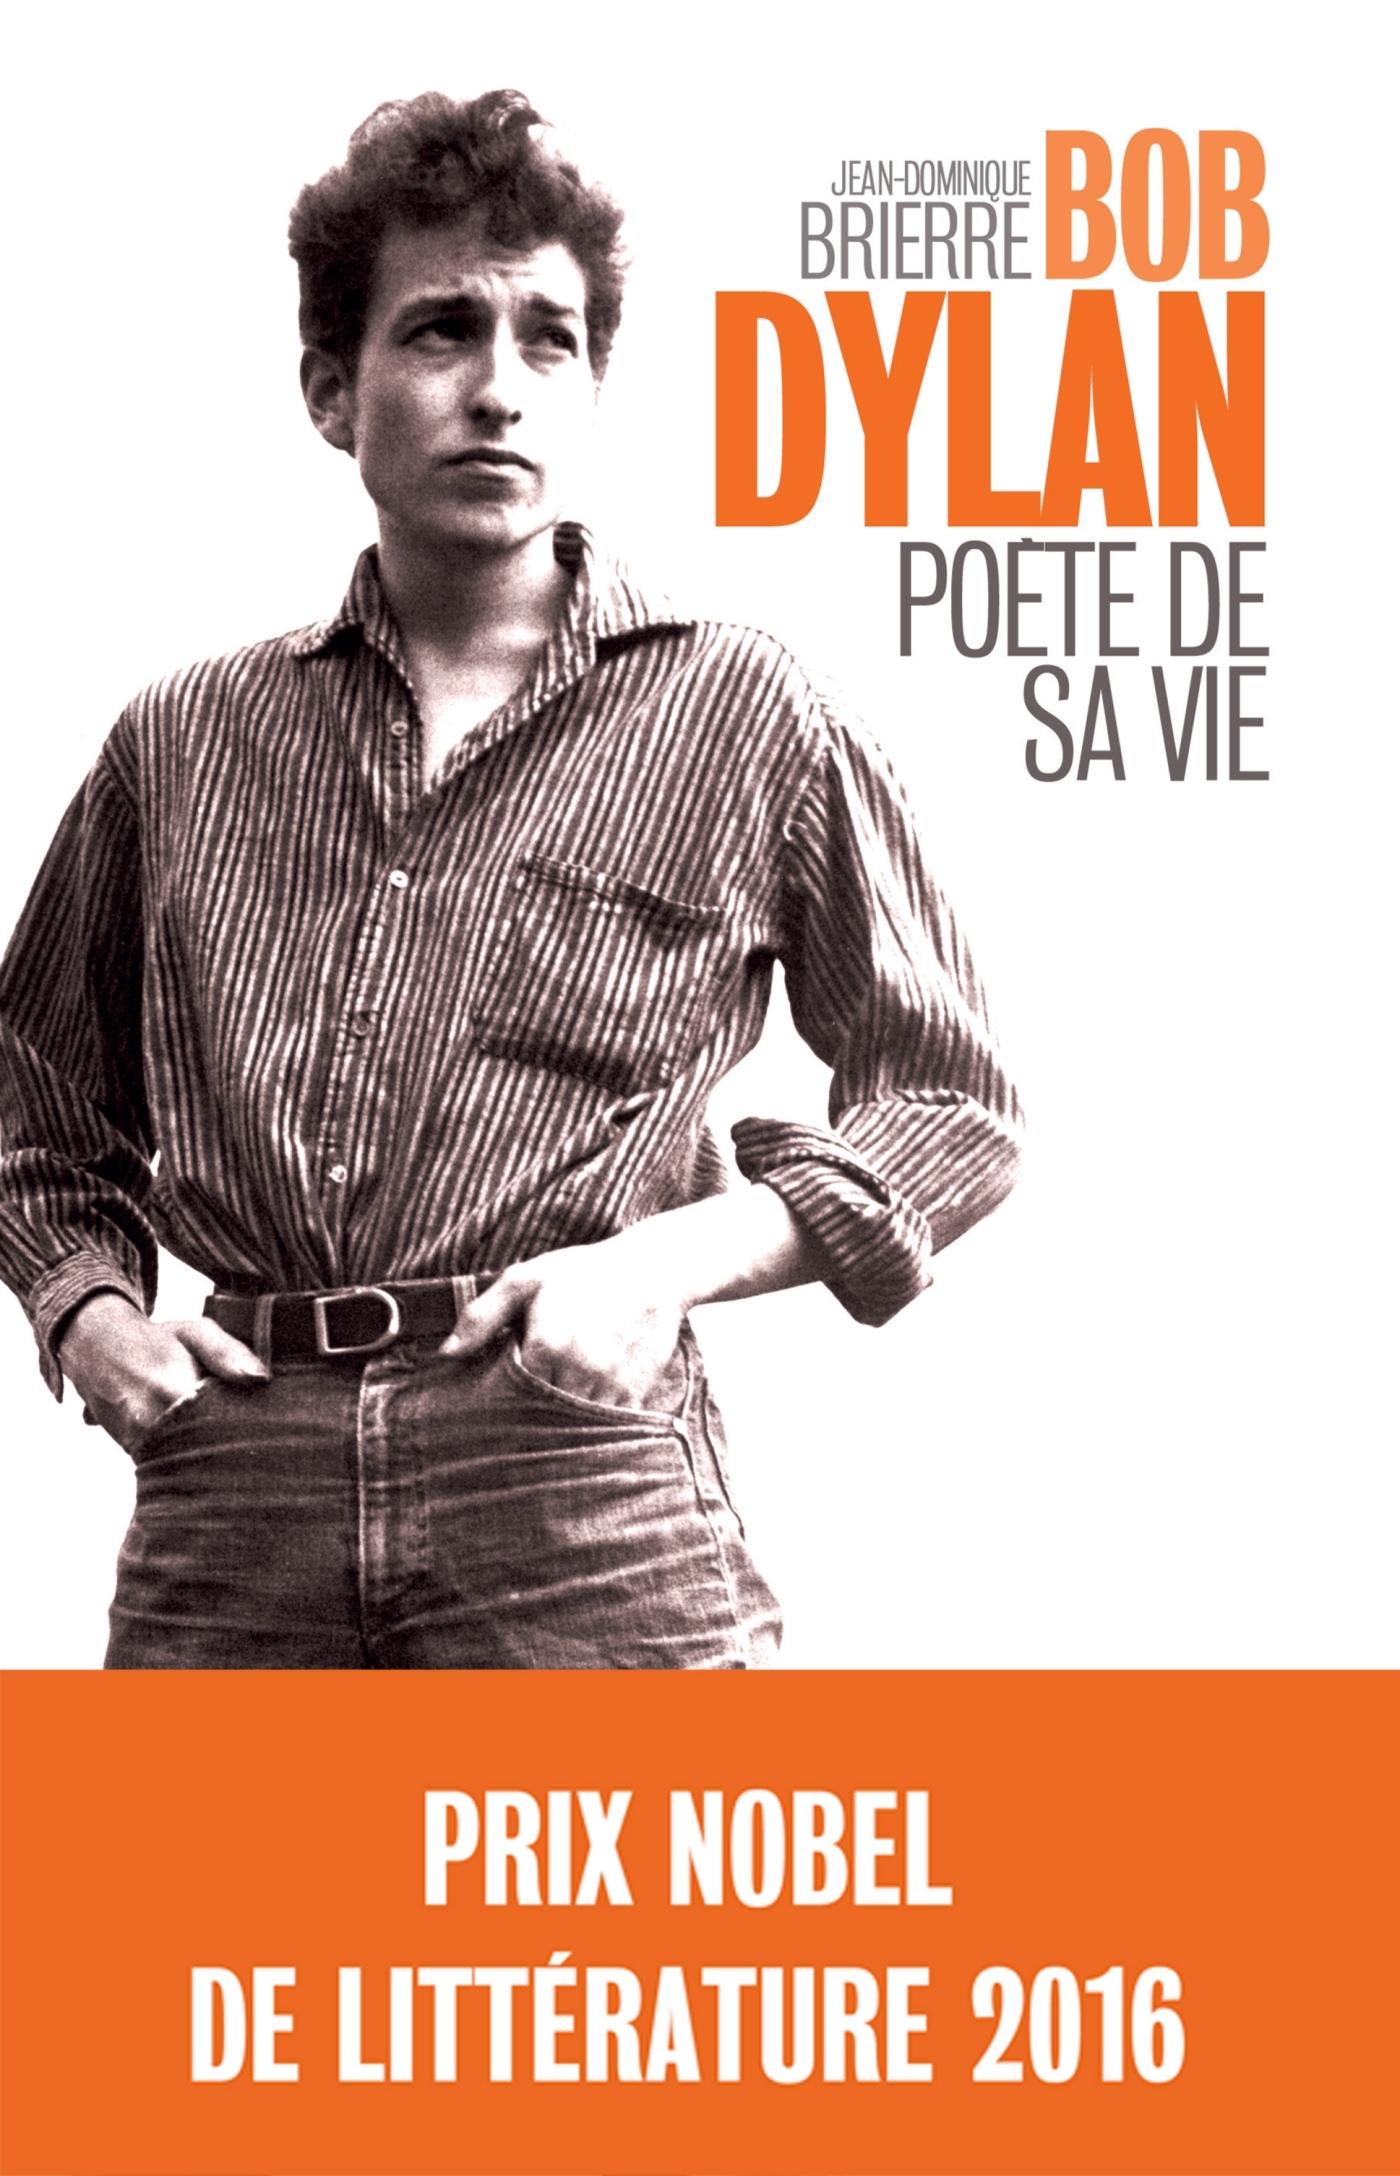 BOB DYLAN, POETE DE SA VIE